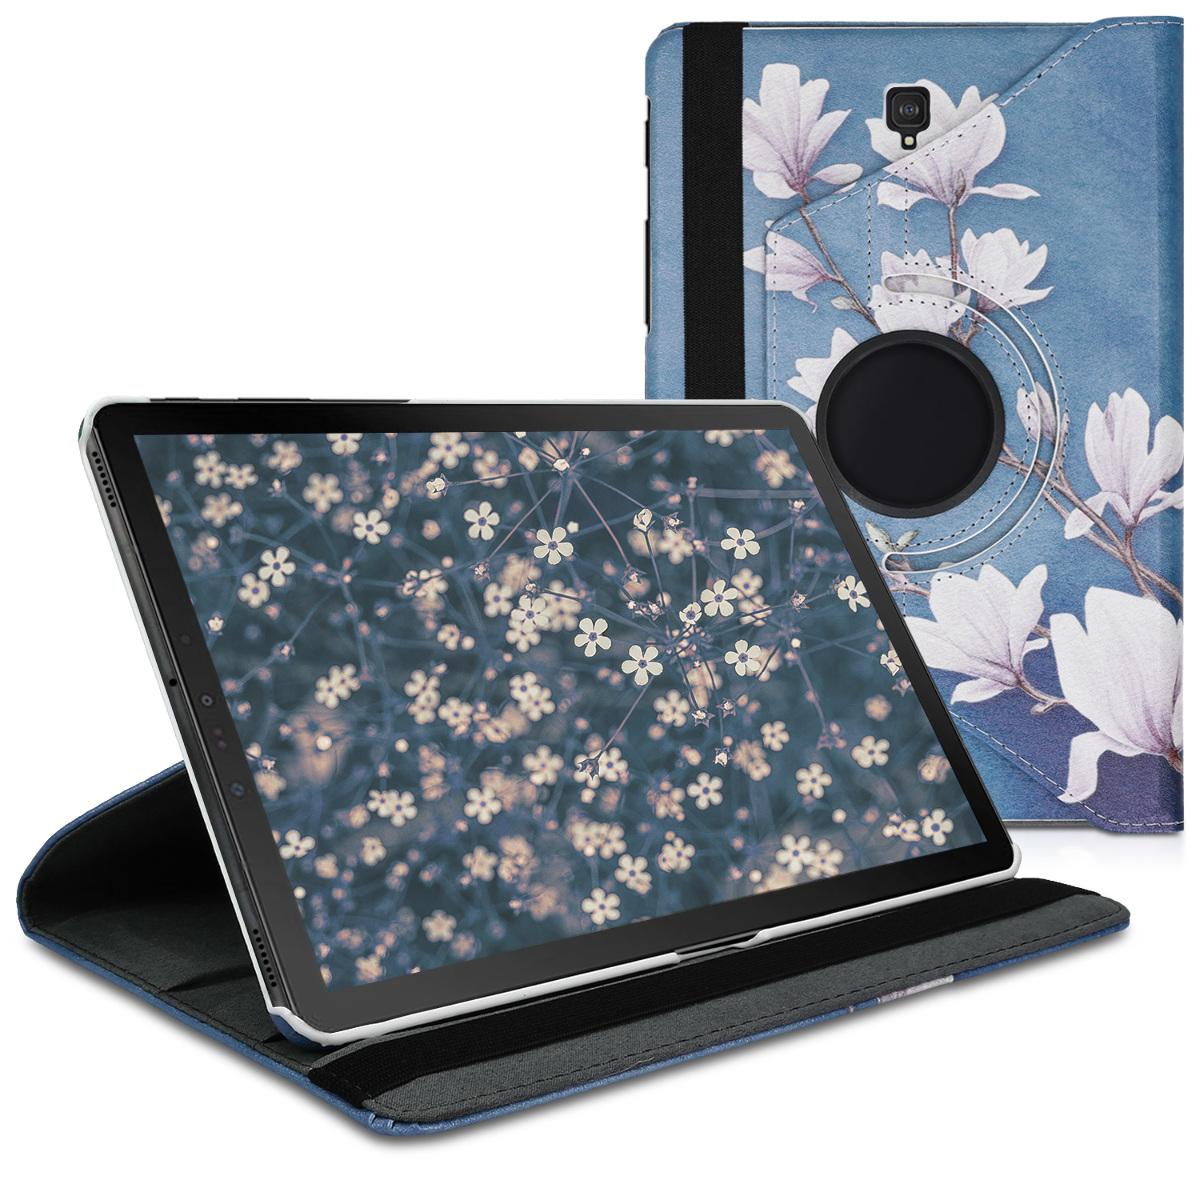 KW Θήκη 360° Samsung Galaxy Tab S4 10.5 - Taupe / White / Blue Grey (46920.01)